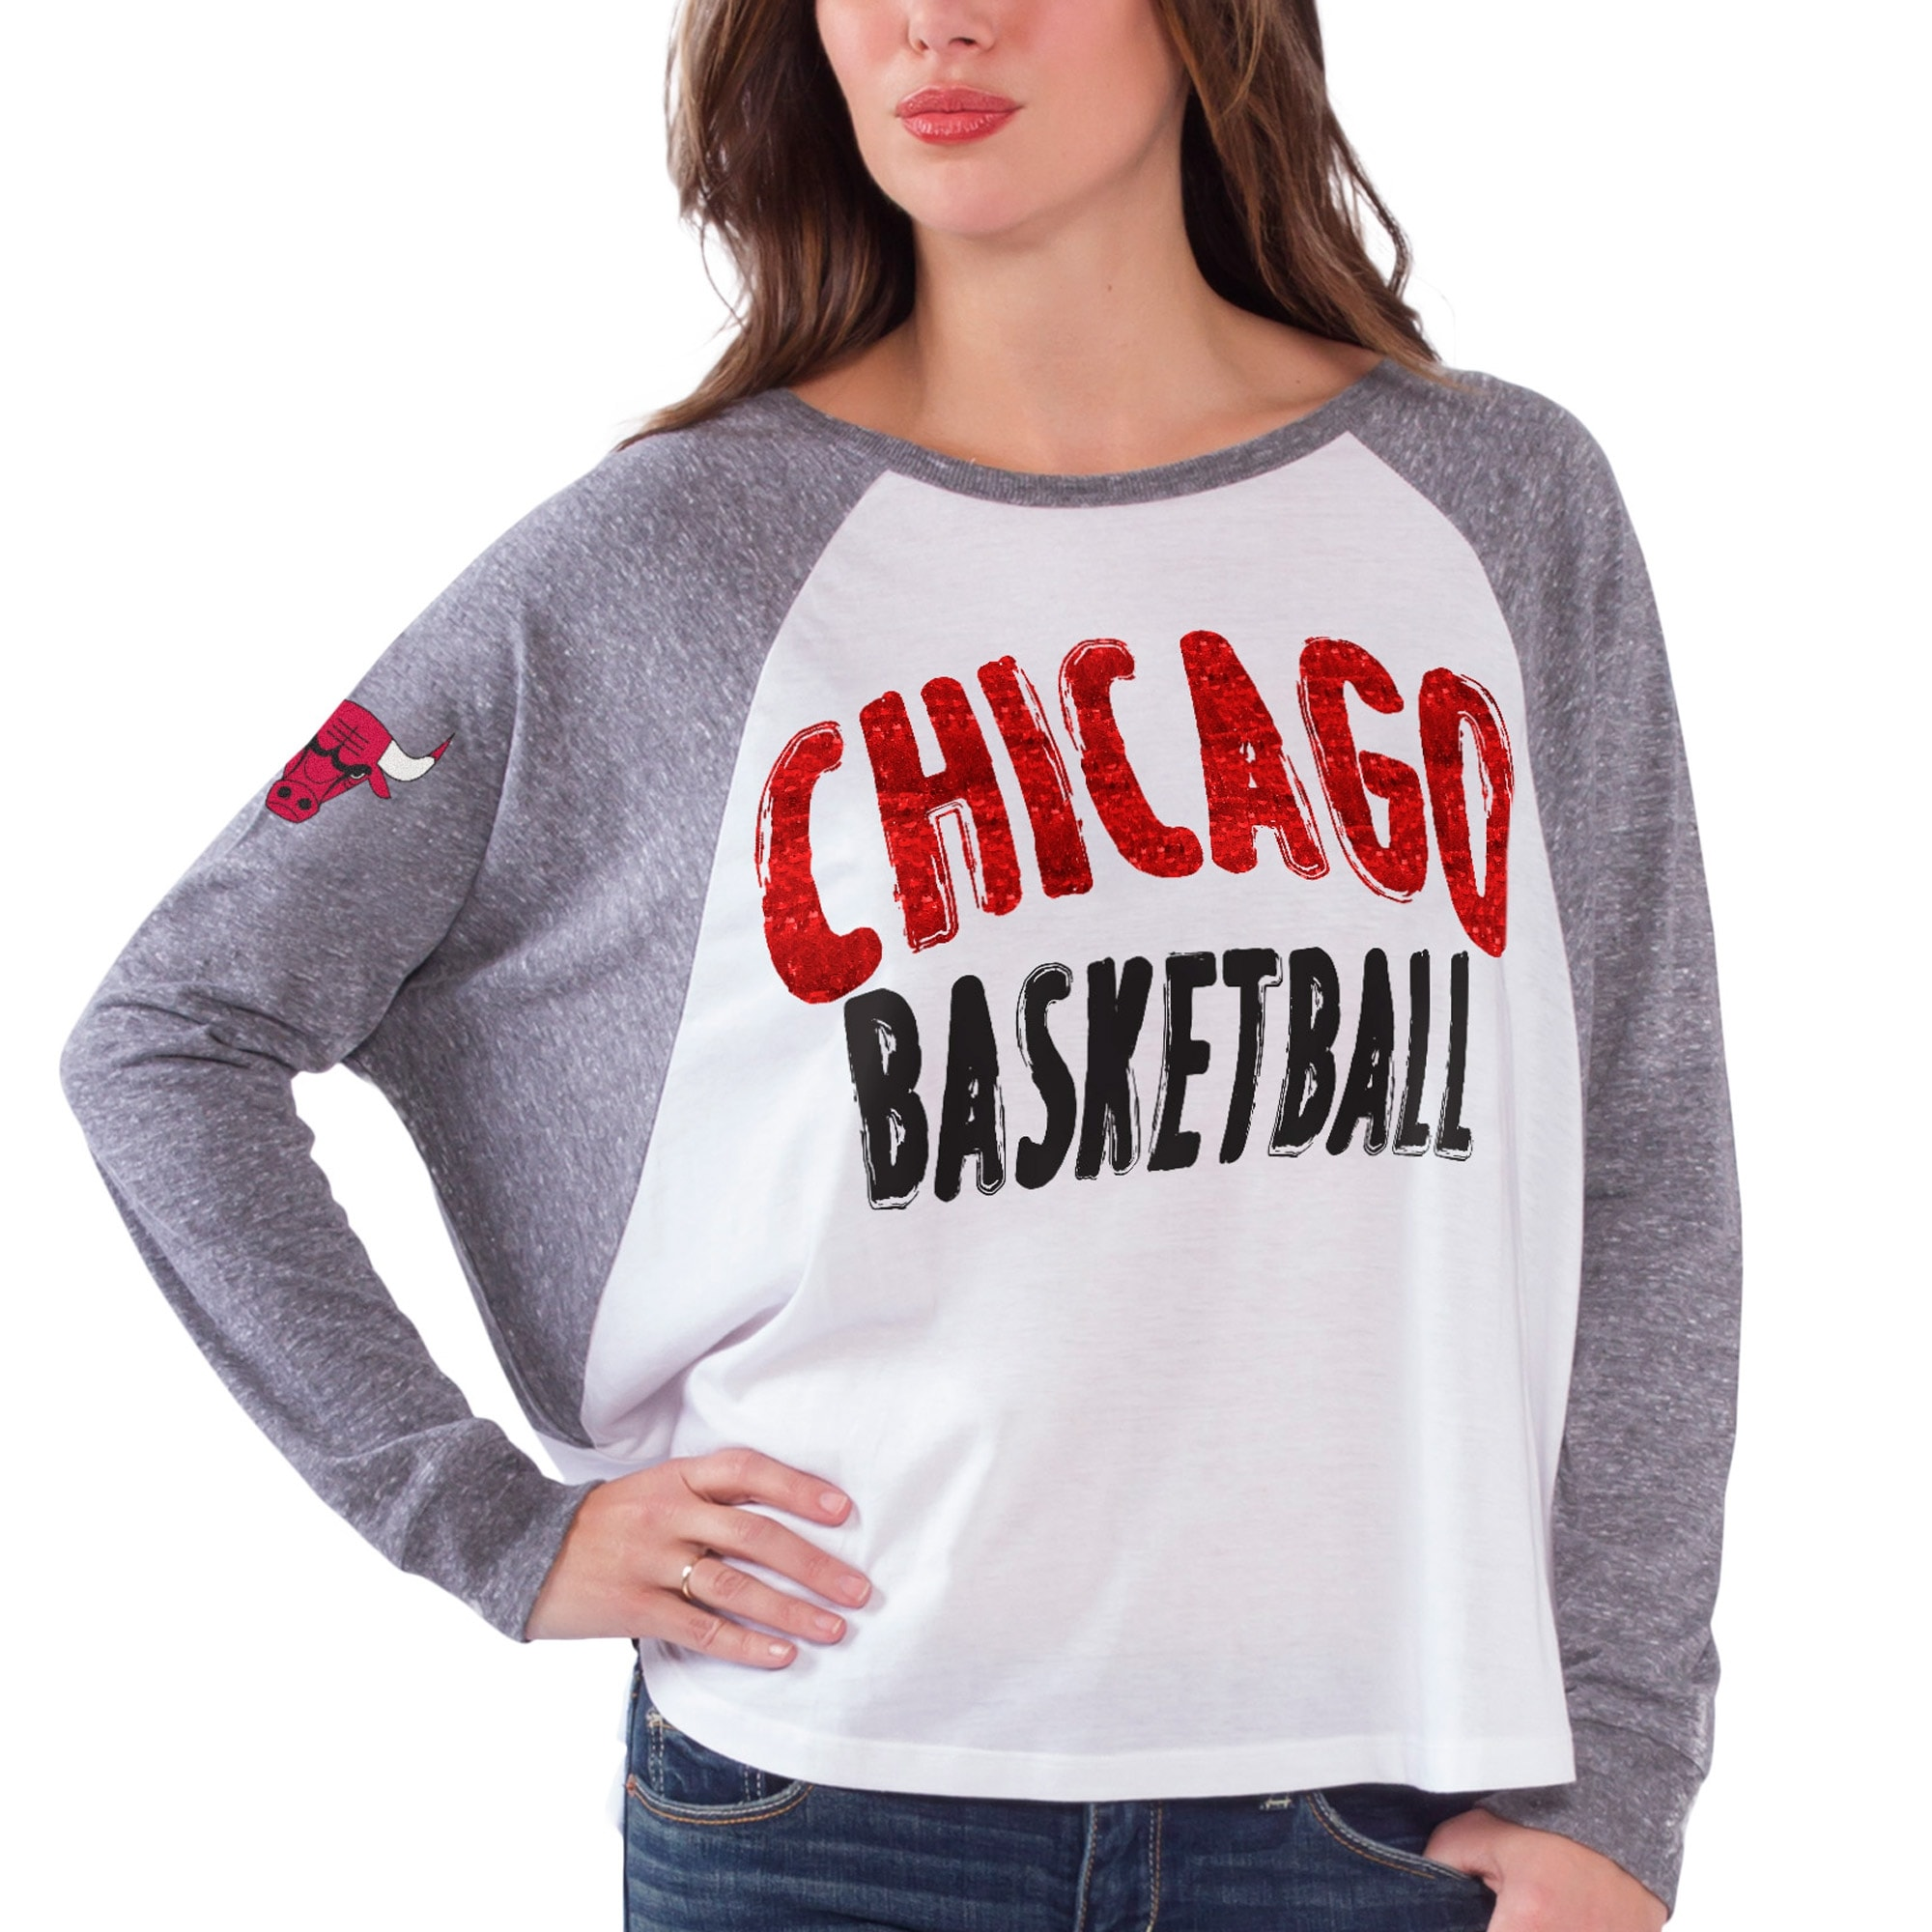 Chicago Bulls Women's Triple A Long Sleeve T-Shirt - White/Gray